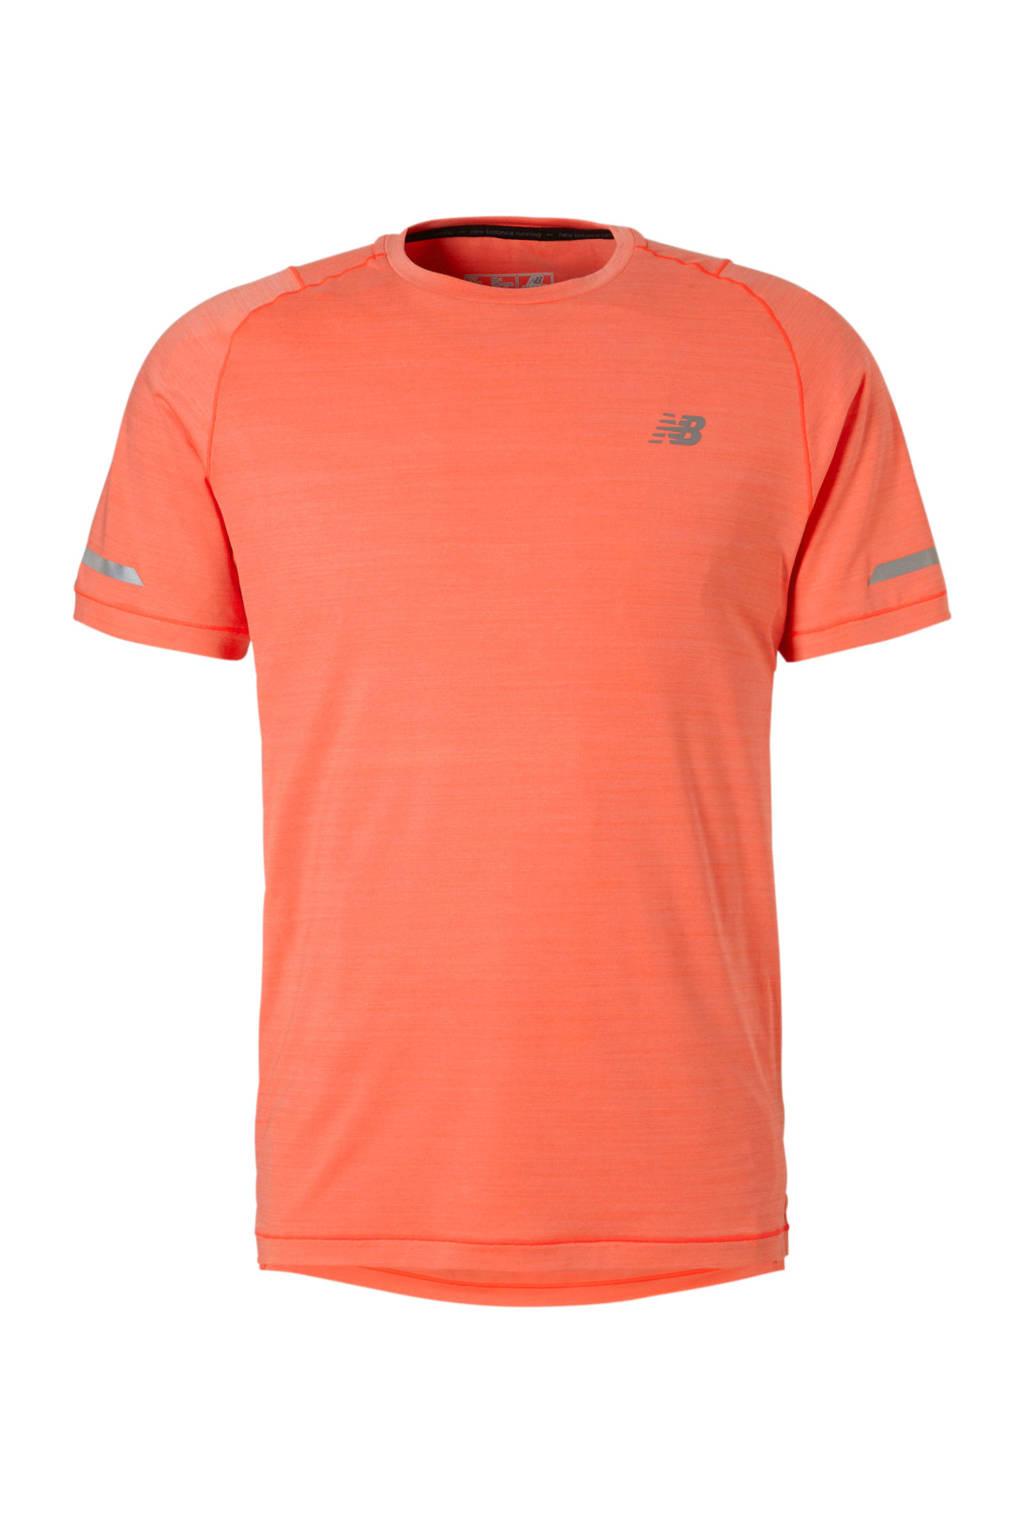 New Balance   sport T-shirt koraalrood, Koraalrood